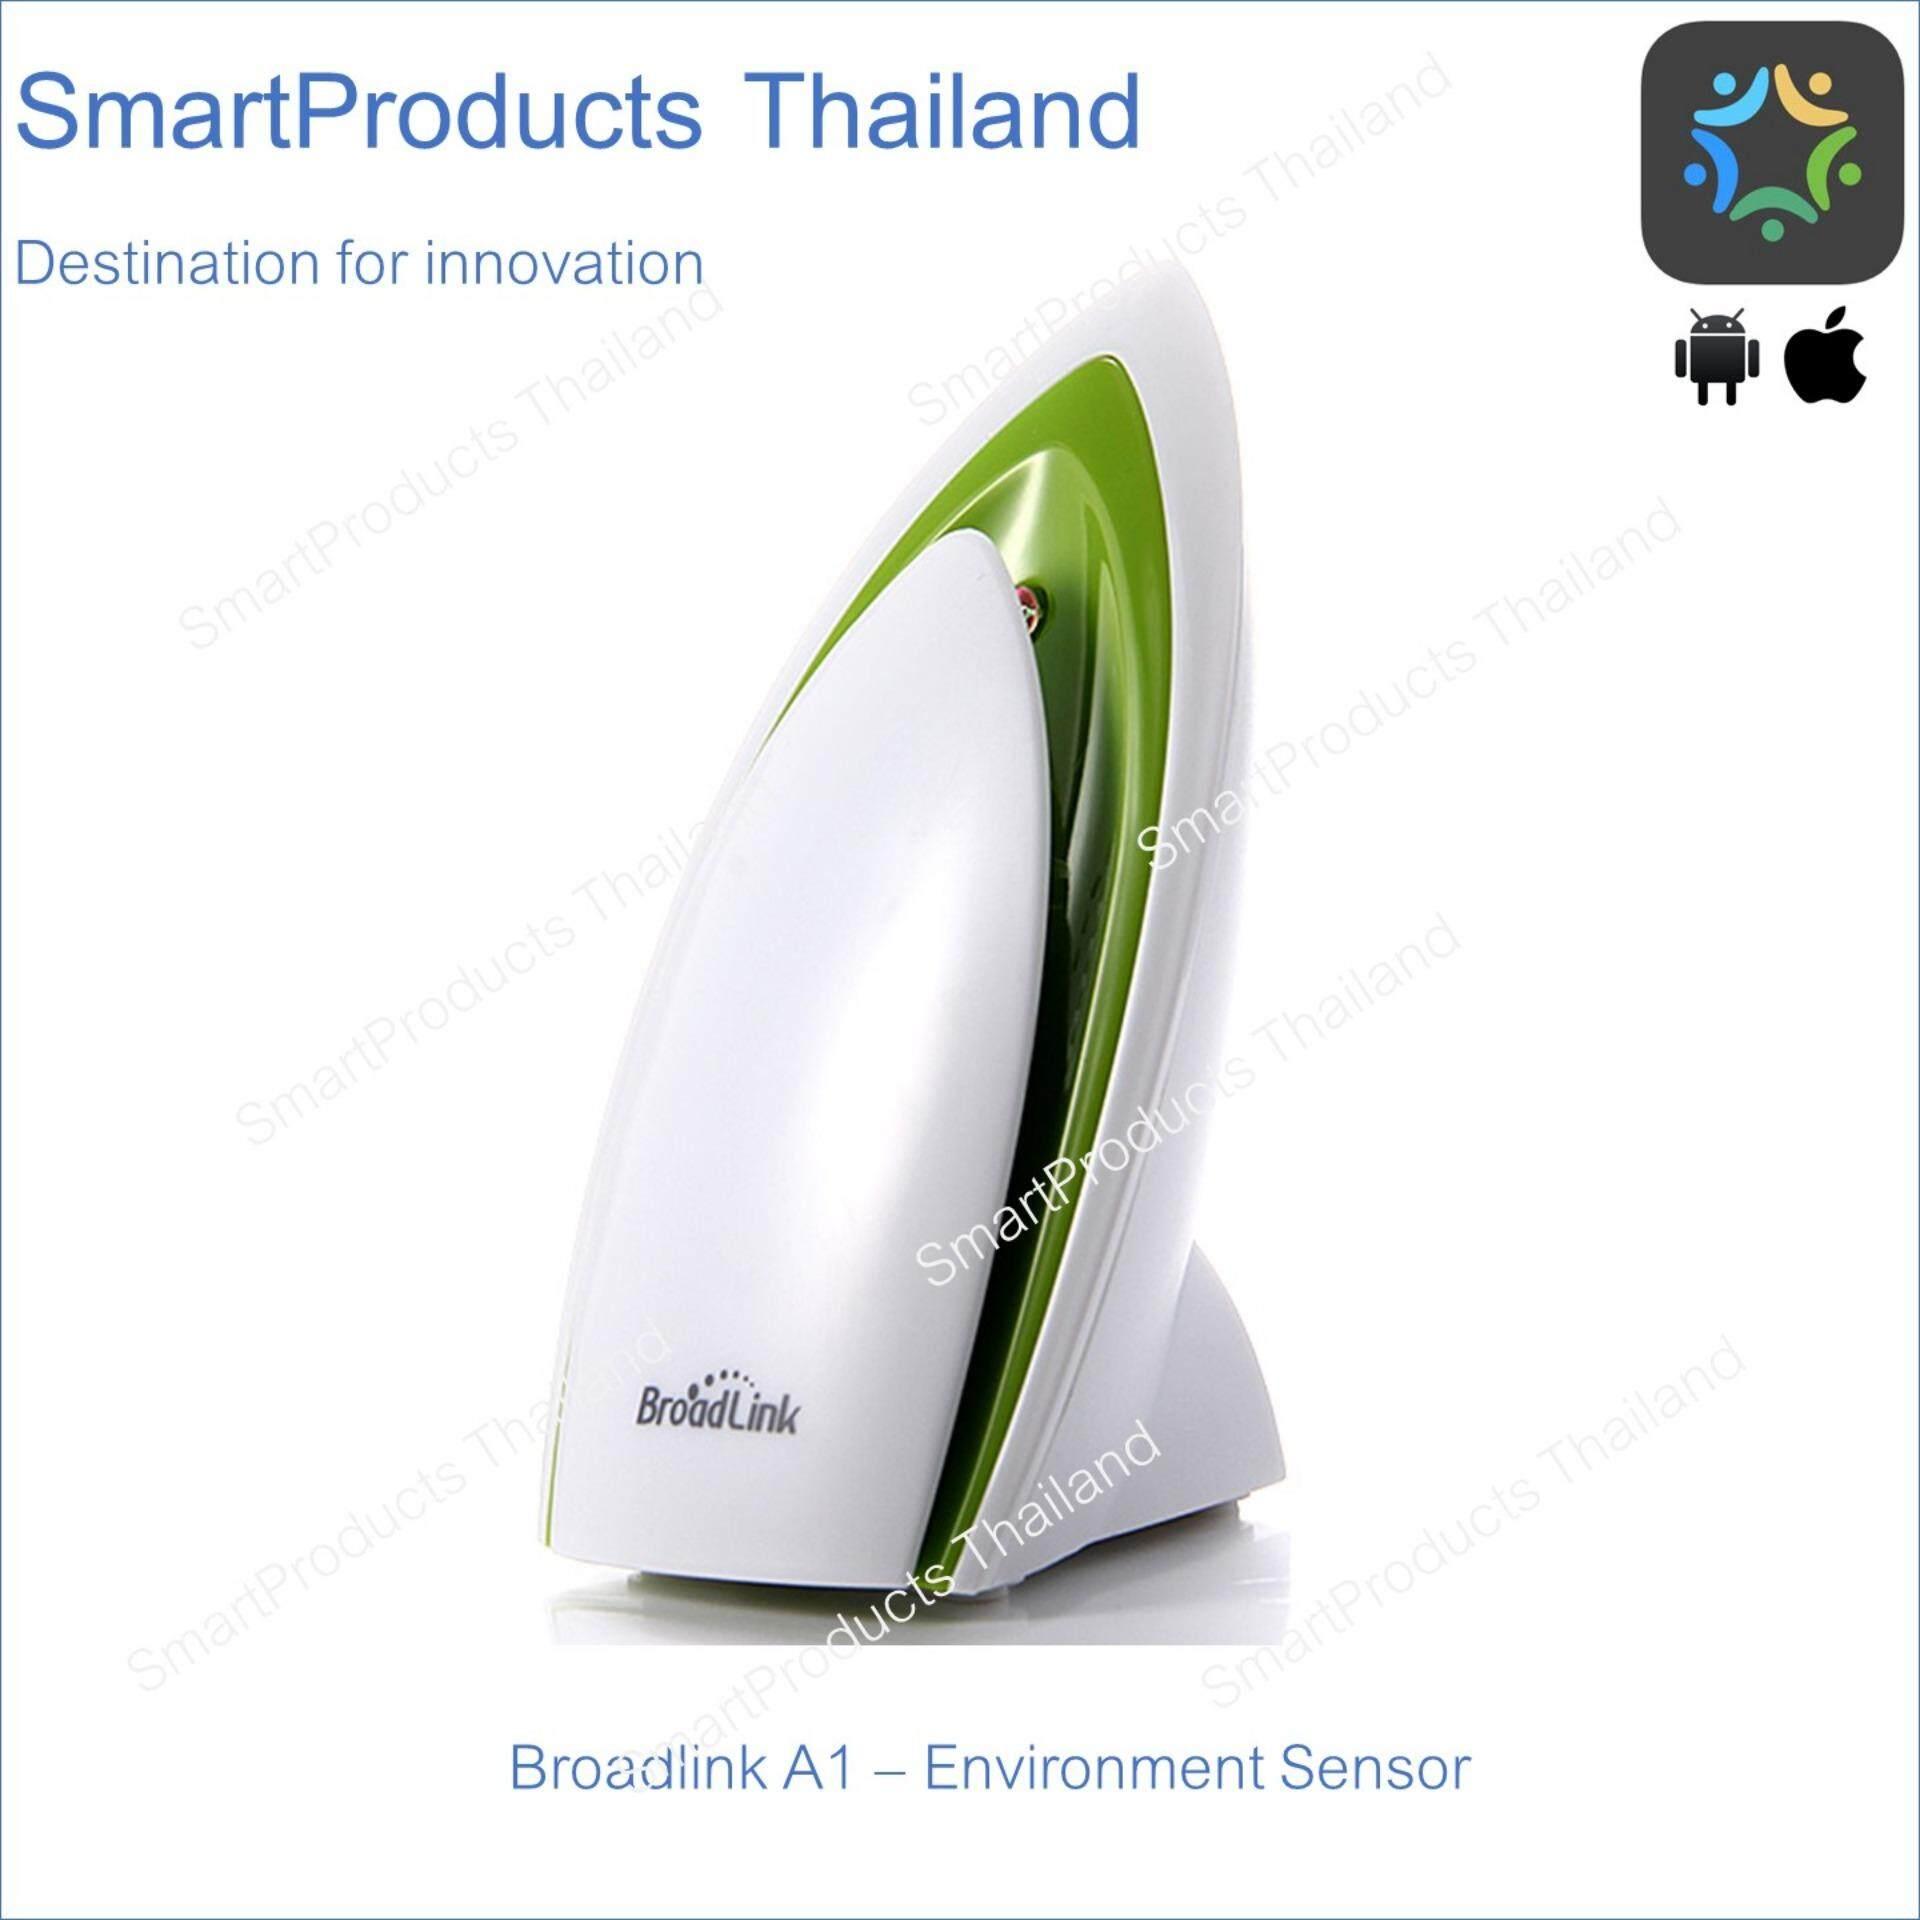 A1 - Broadlink Smart Environment Sensor (VOC, Sound, Light, Humidity, Temperature)